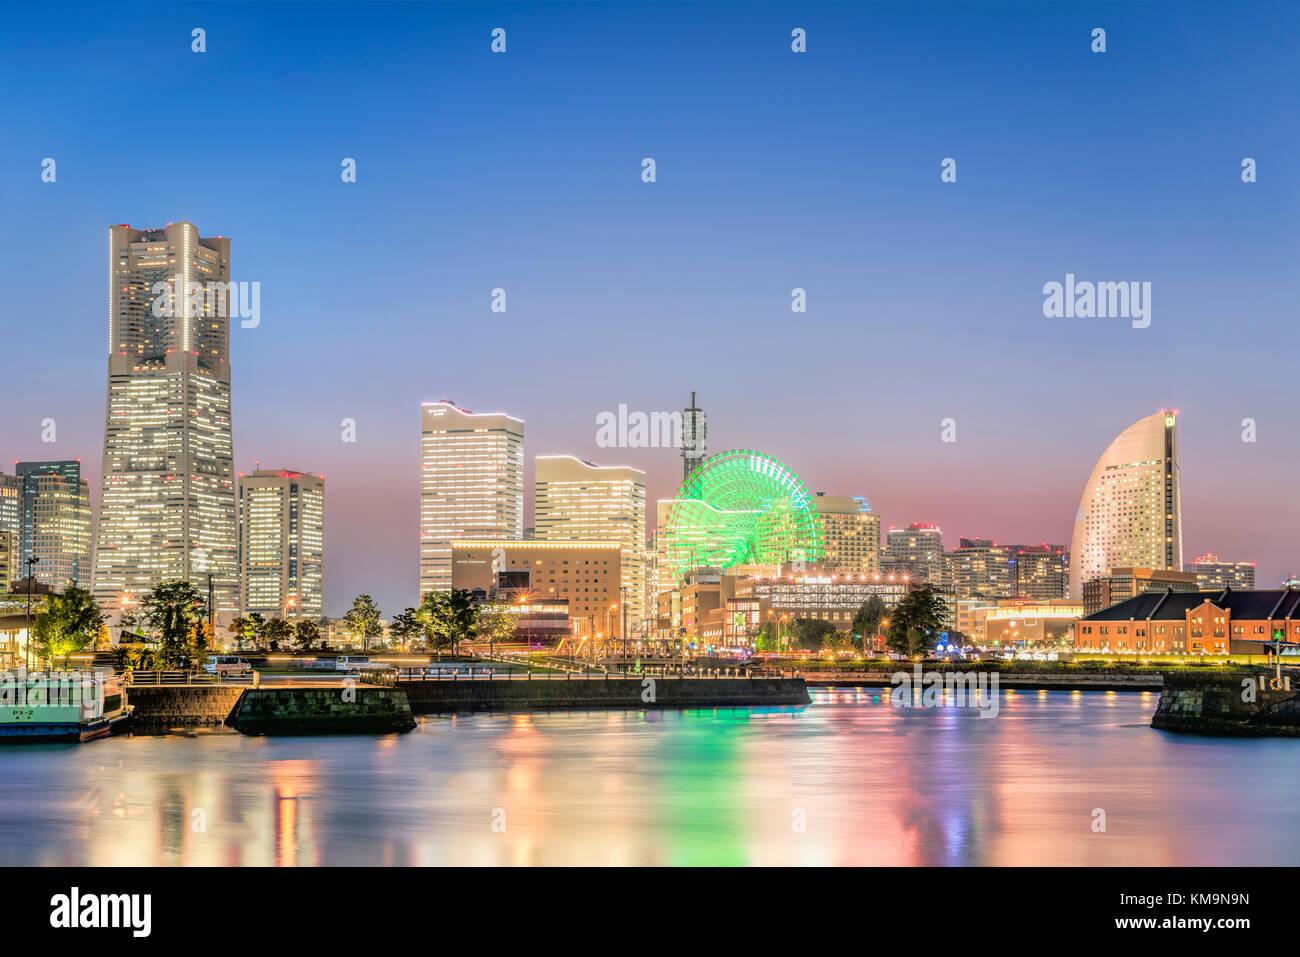 Illuminated skyline of Yokohama at dawn, Kanagawa, Japan | Beleuchtete Skyline von Yokohama am Abend, Kanagawa, - Stock Image